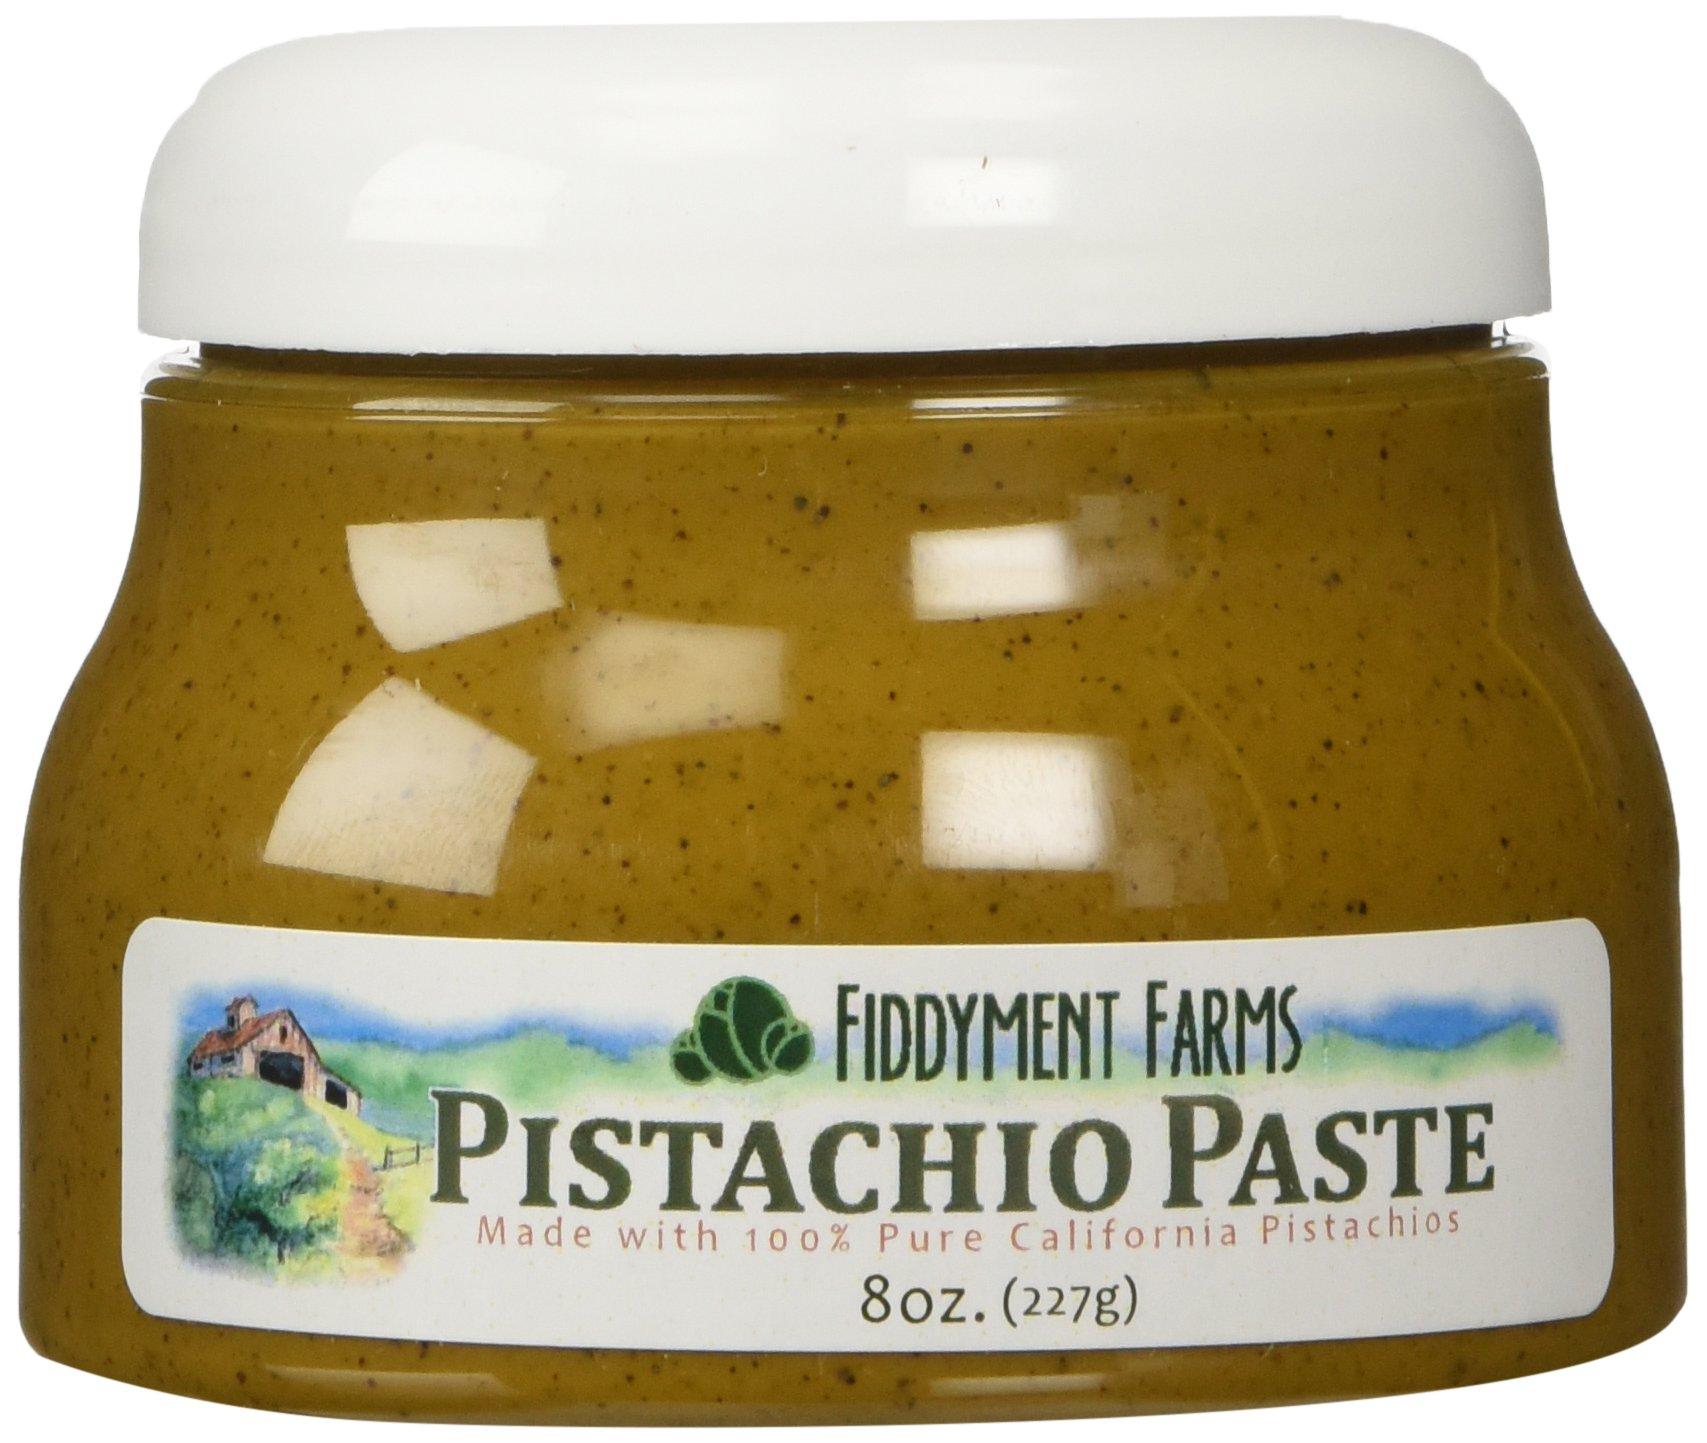 Fiddyment Farms 8 Oz. Pistachio Paste by Fiddyment Farms